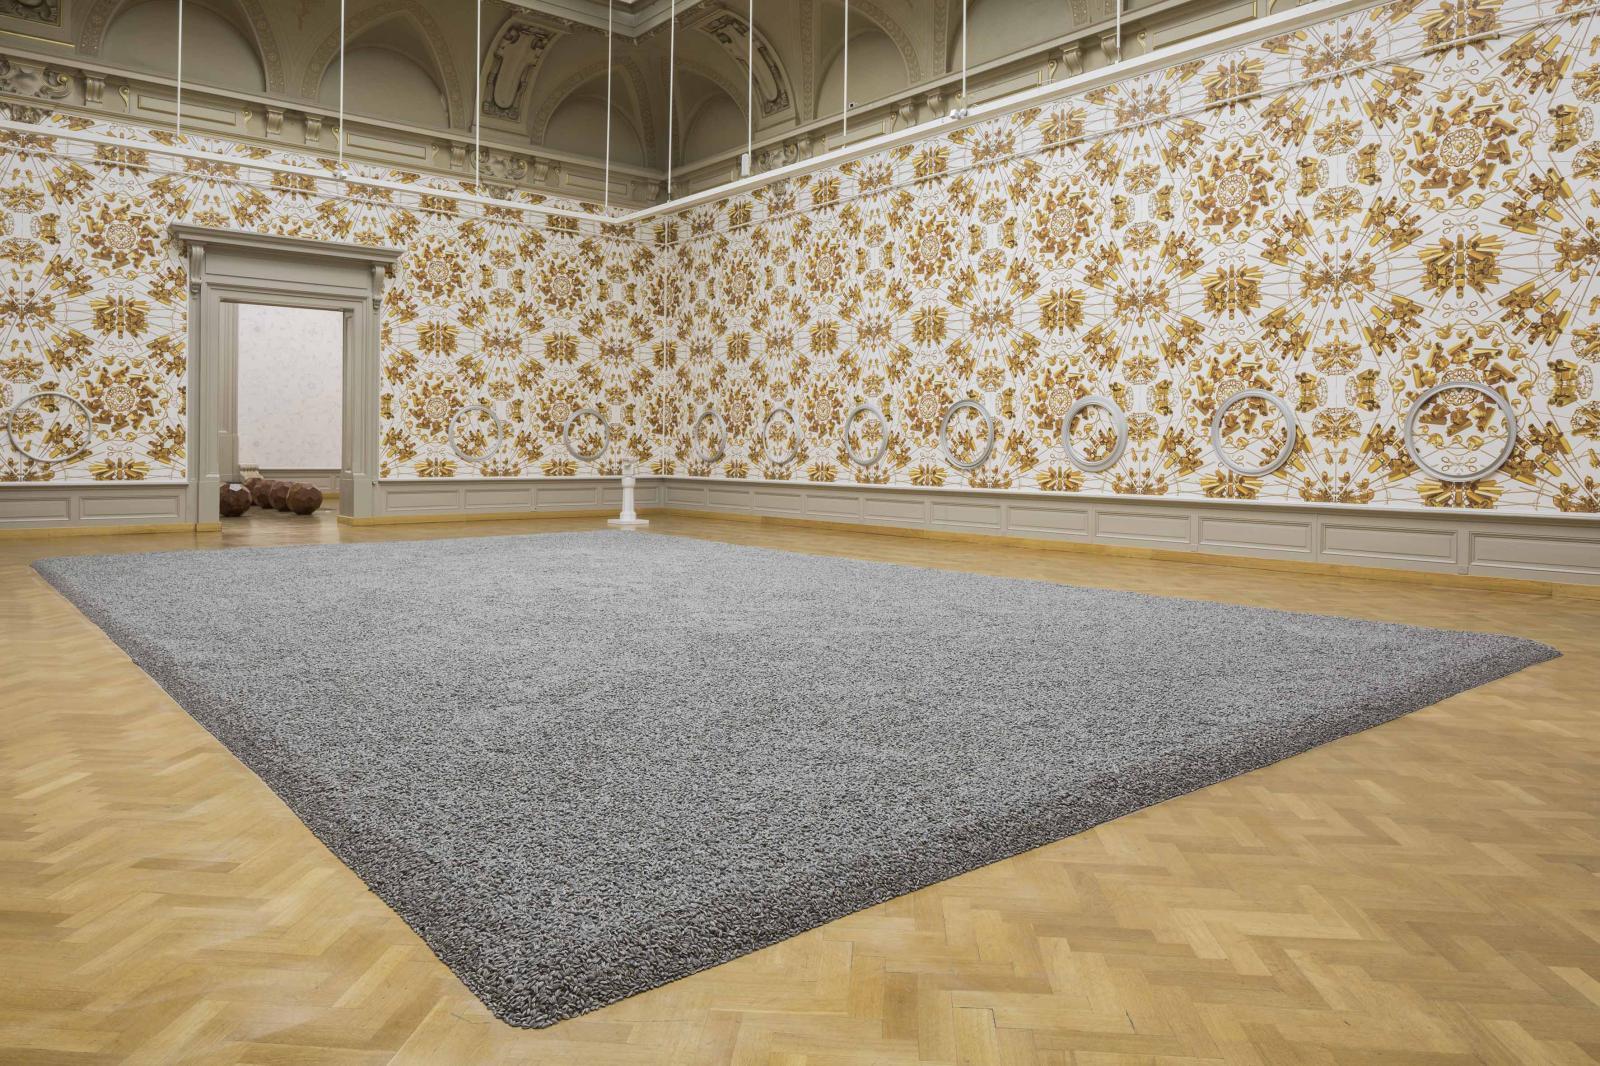 Sunflower Seeds (2010, porcelaine) et The Animal That Looks Like a Llama but is Really an Alpaca (2015, papier peint), exposition «Ai Weiwei. D'ailleu